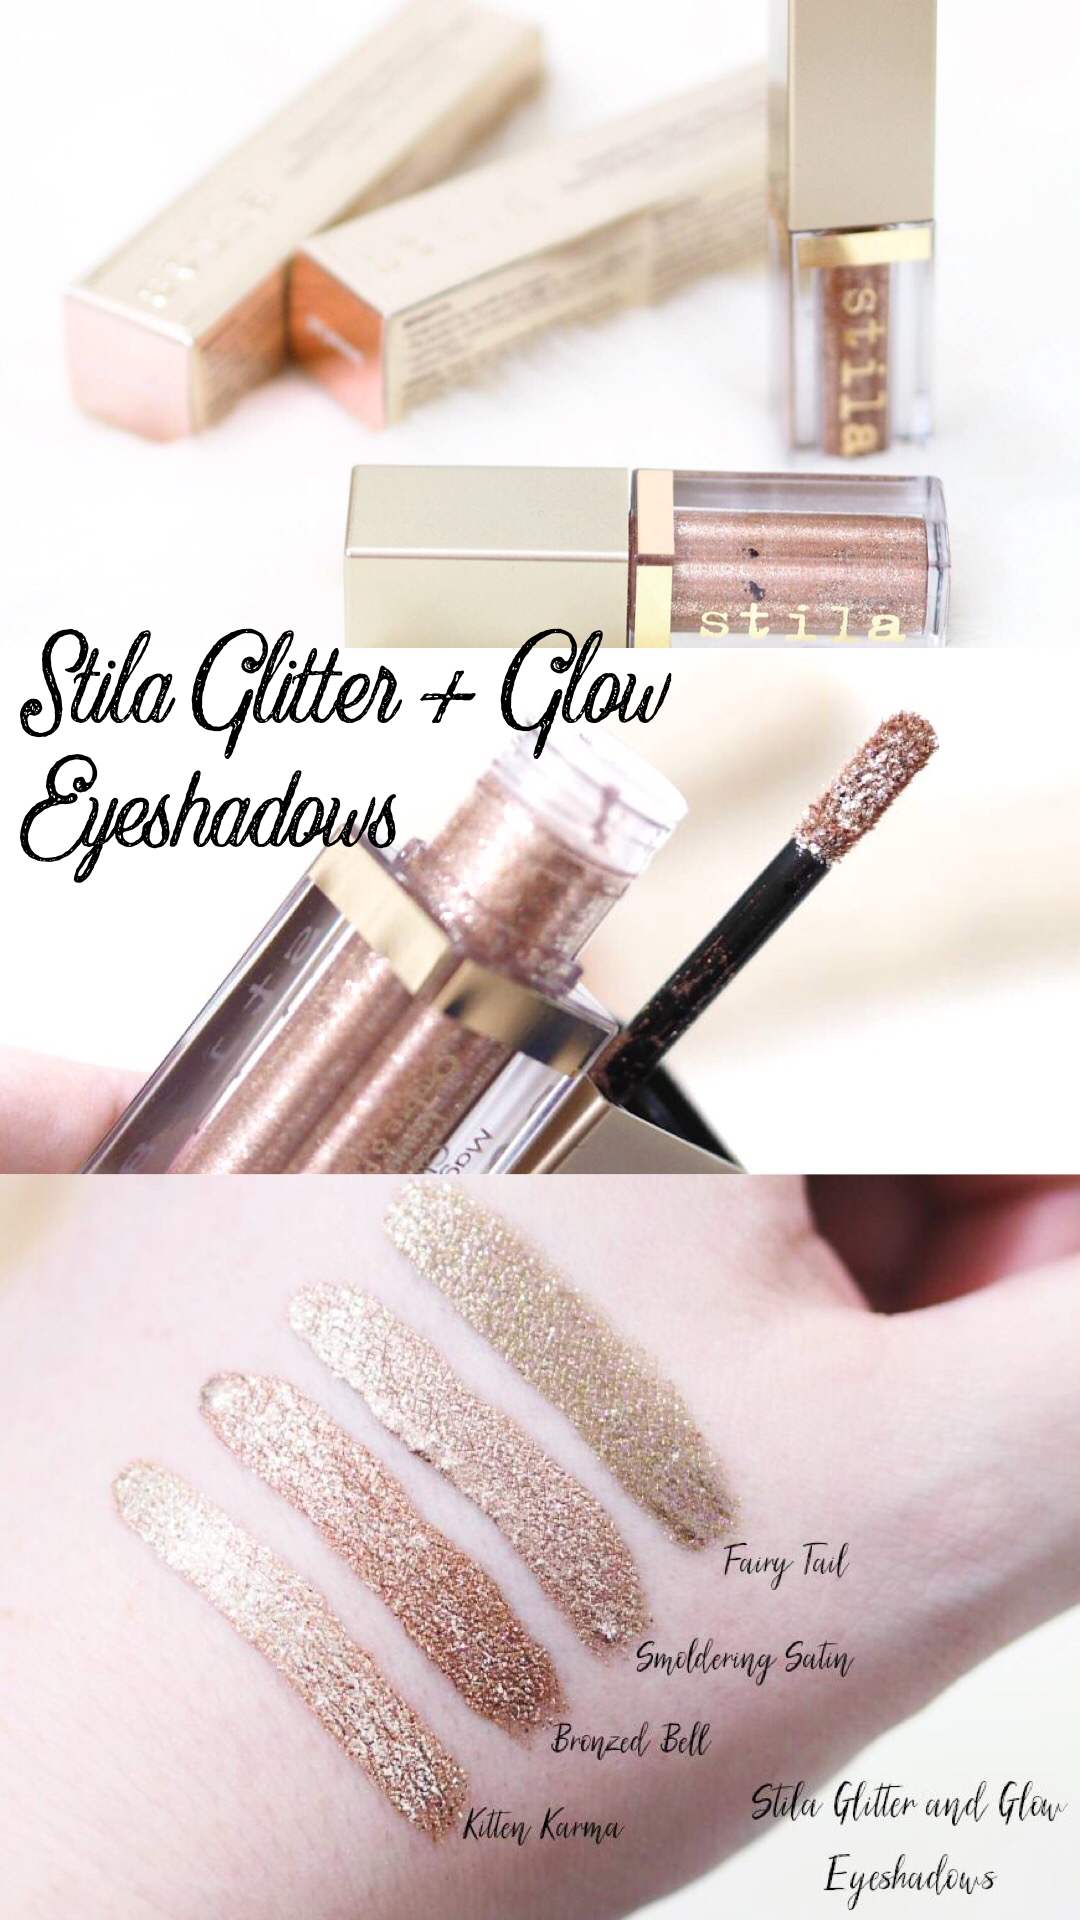 Stila Glitter And Glow Liquid Glitter Eyeshadows Ft Kitten Karma Fairy Tail Bronzed Bell And Smoulder Stila Glitter And Glow Glitter Eyeshadow Stila Glitter